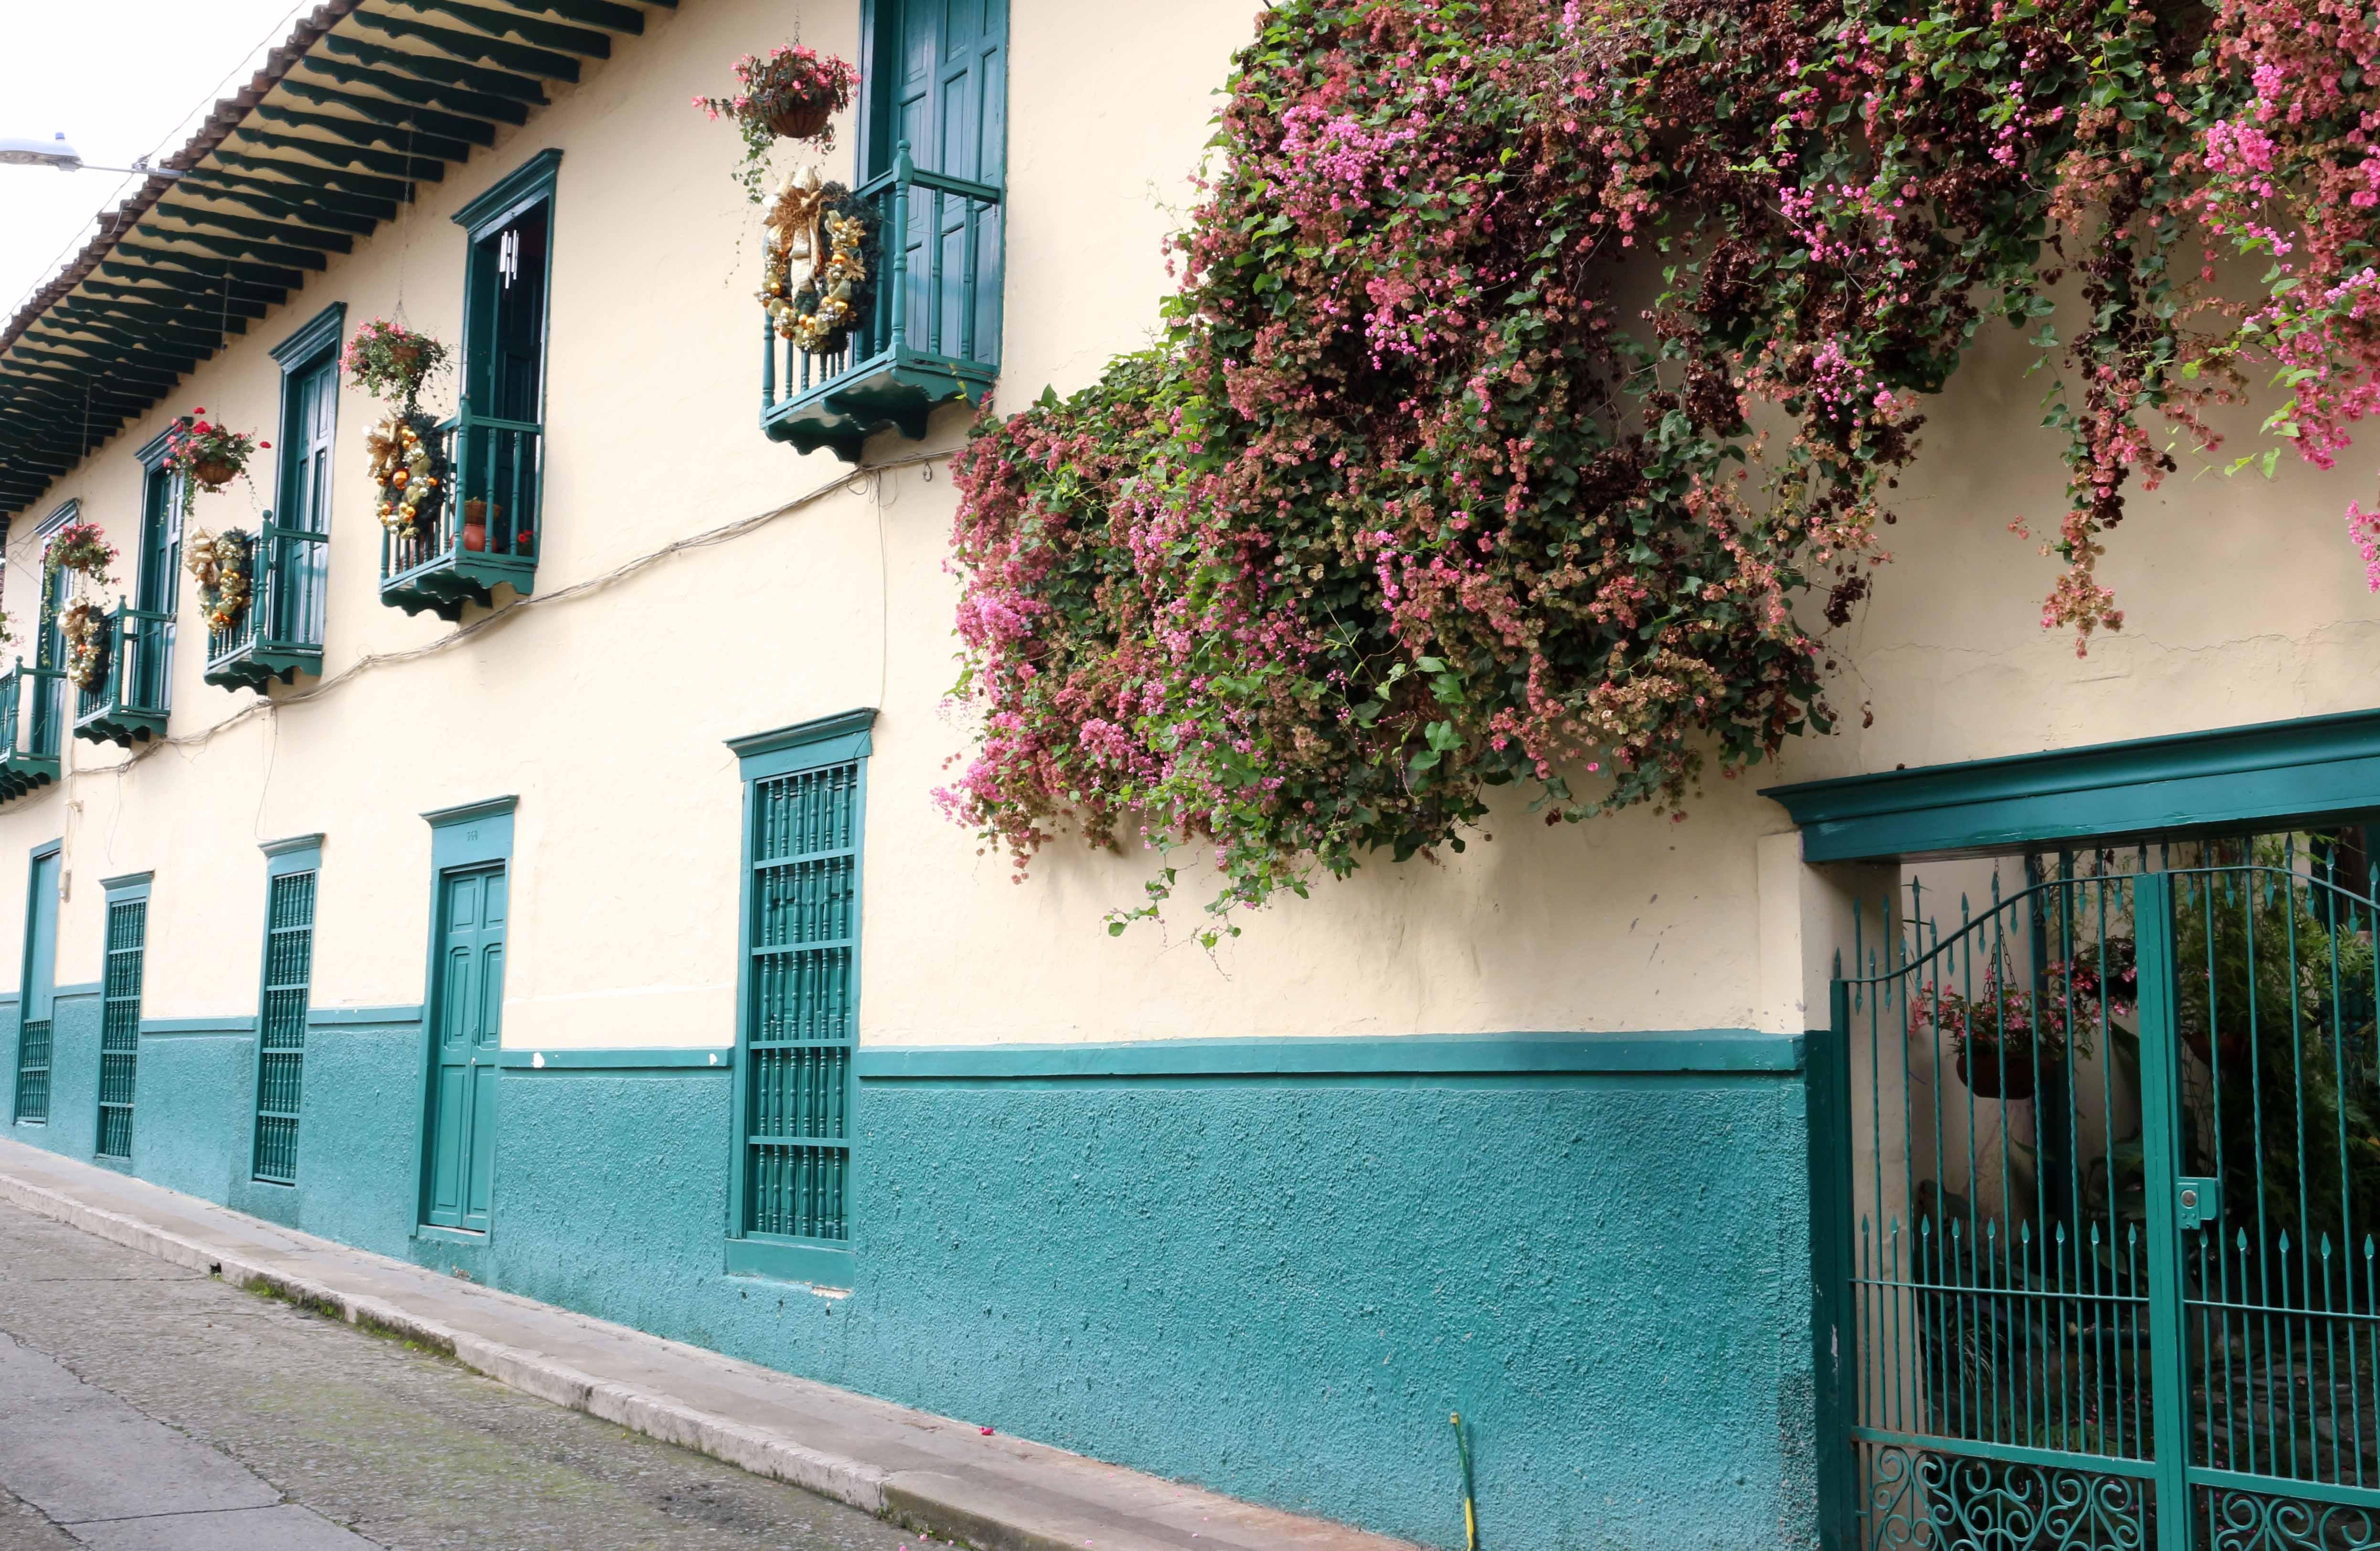 Rues colorées, une grande tradition